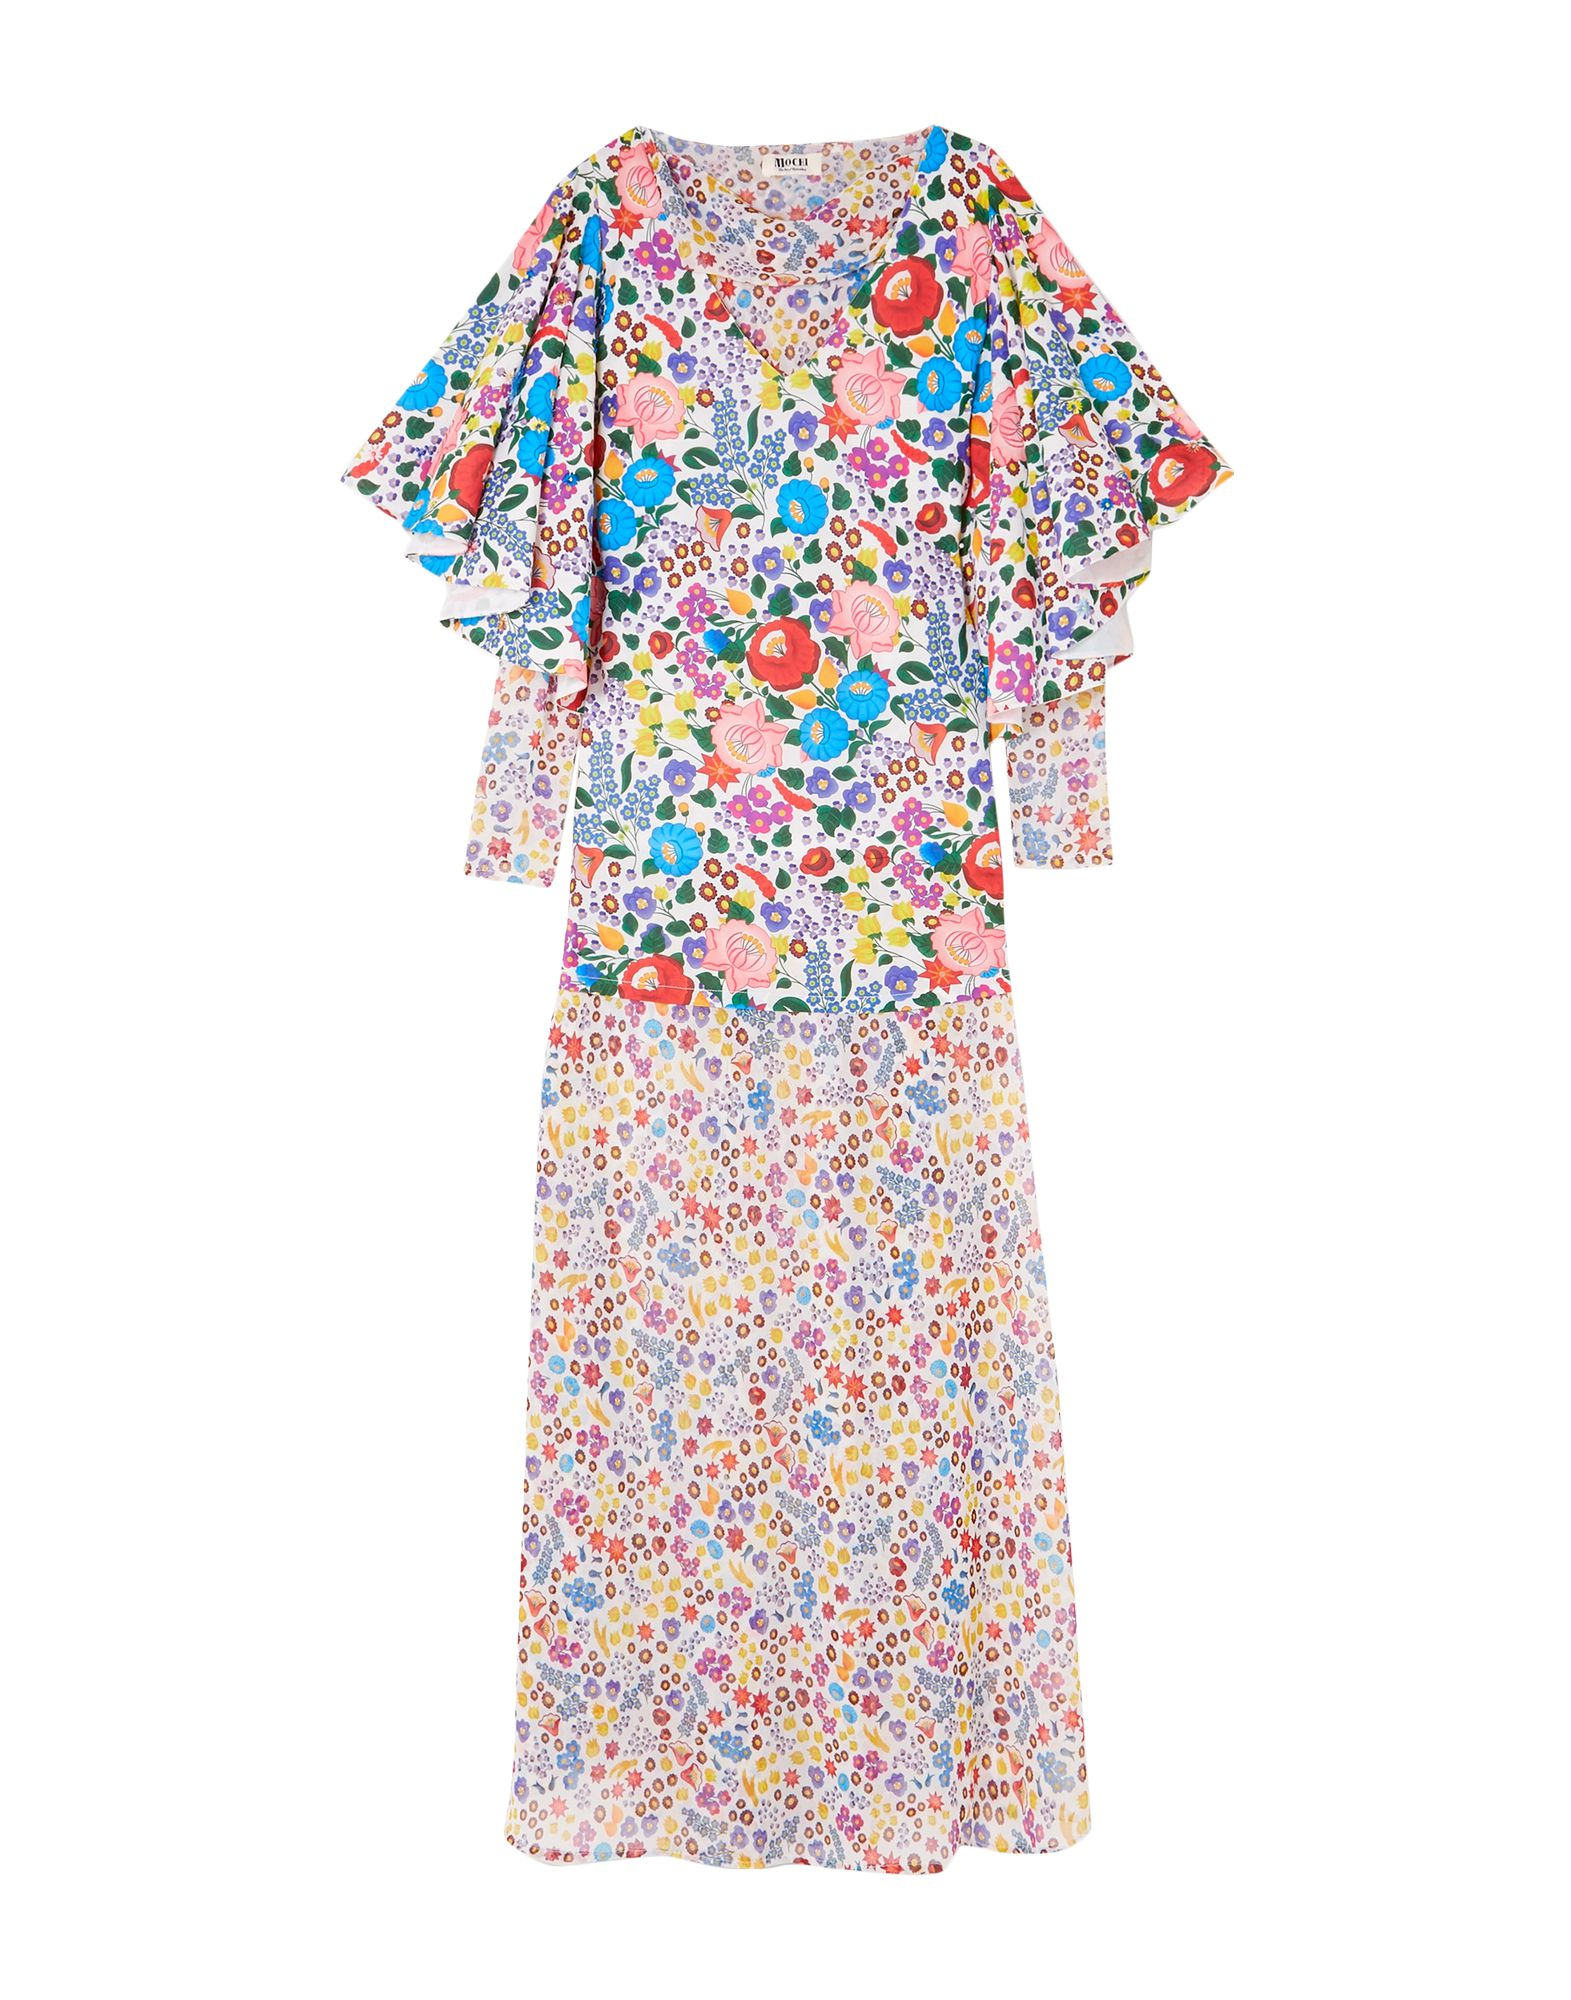 Vestito Lungo All Things Mo  donna donna - 34968494WH  bis zu 70% sparen